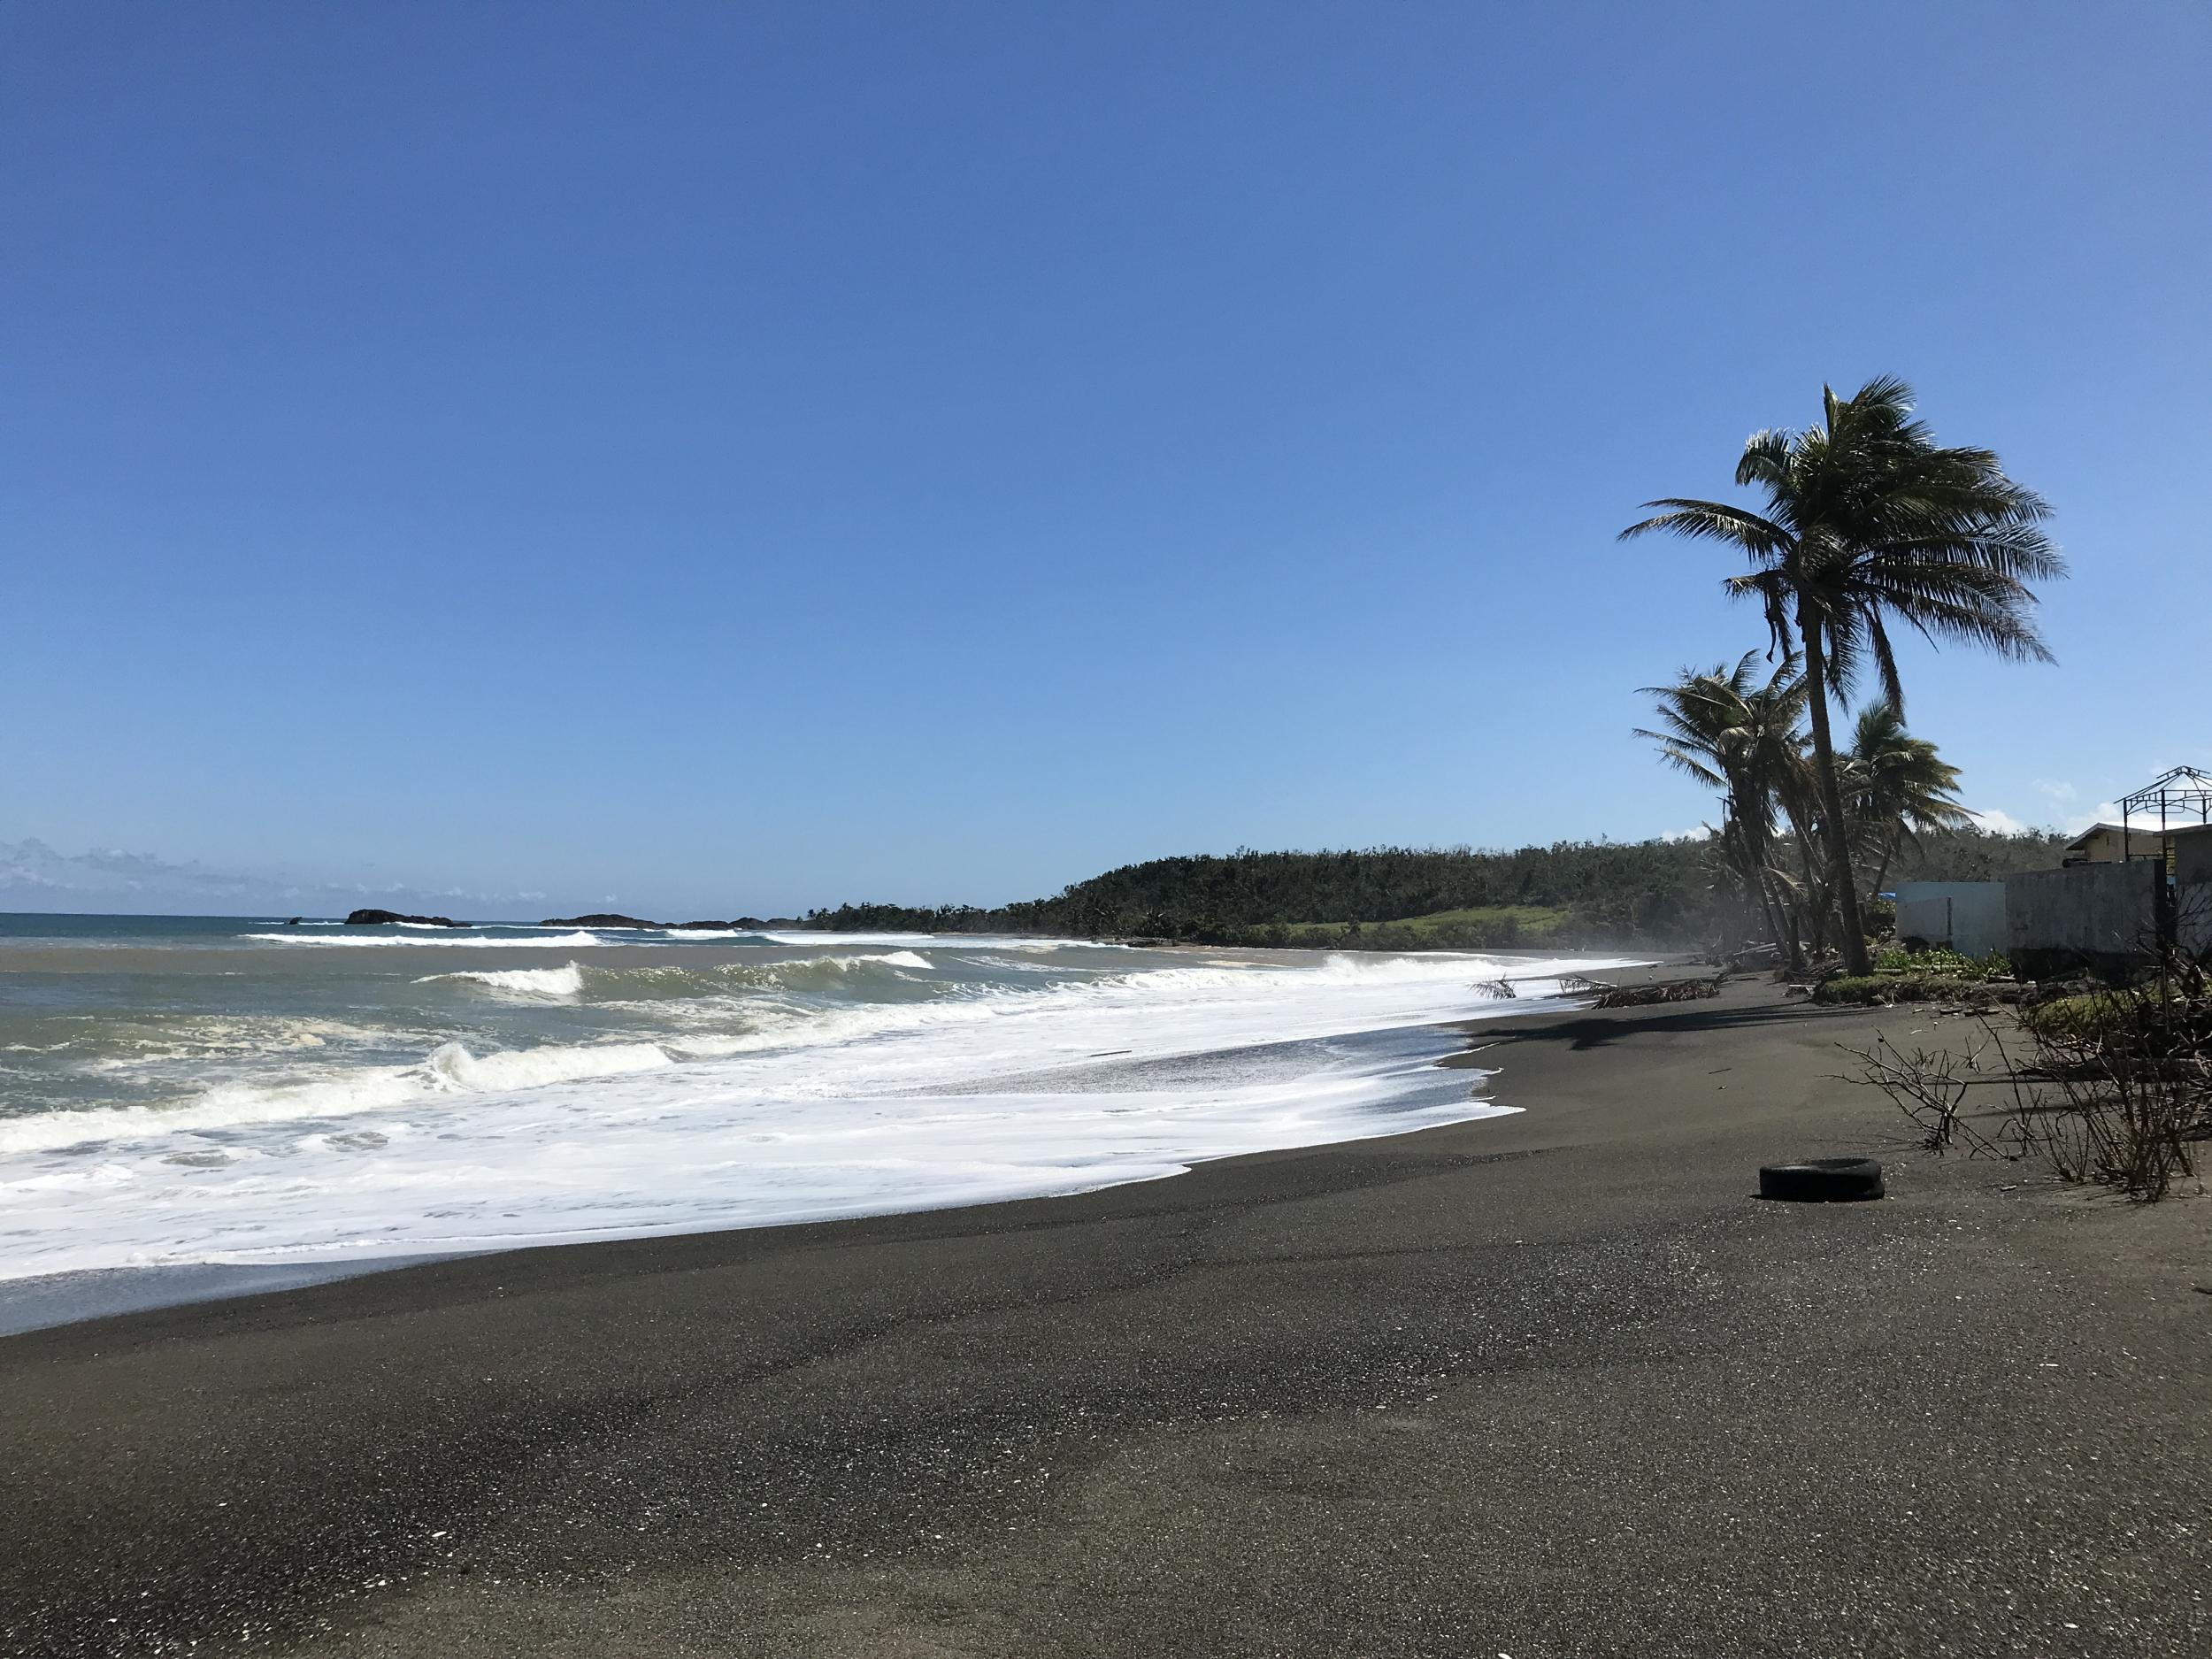 23. Black Sand Beaches